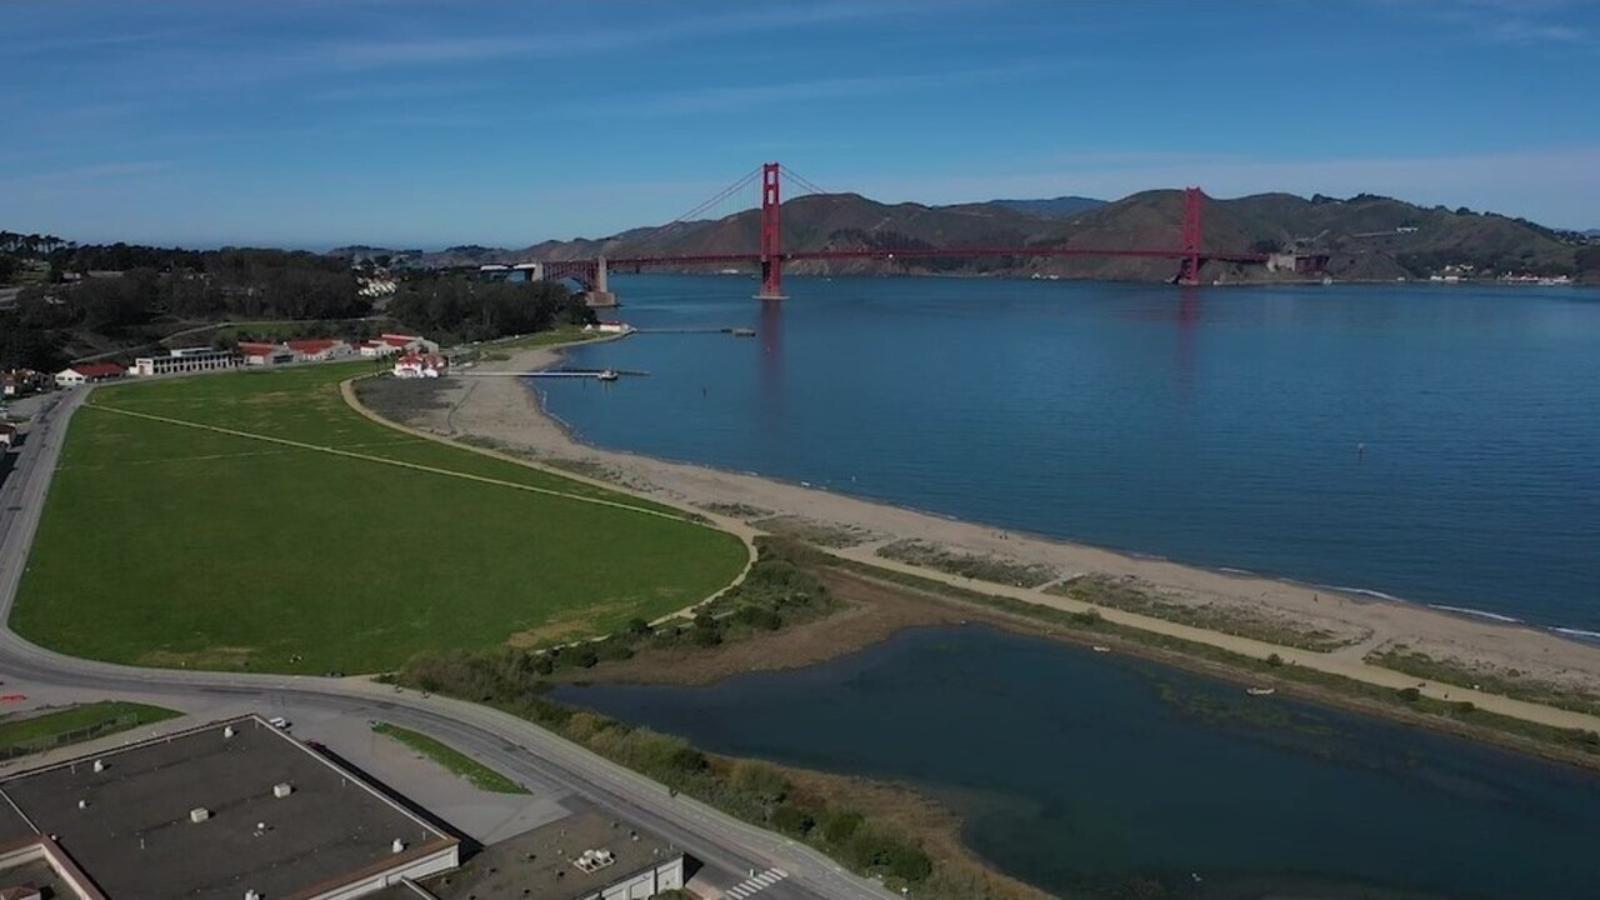 Rep. Jackie Speier backed $125 million bill first step towards restoring San Francisco Bay